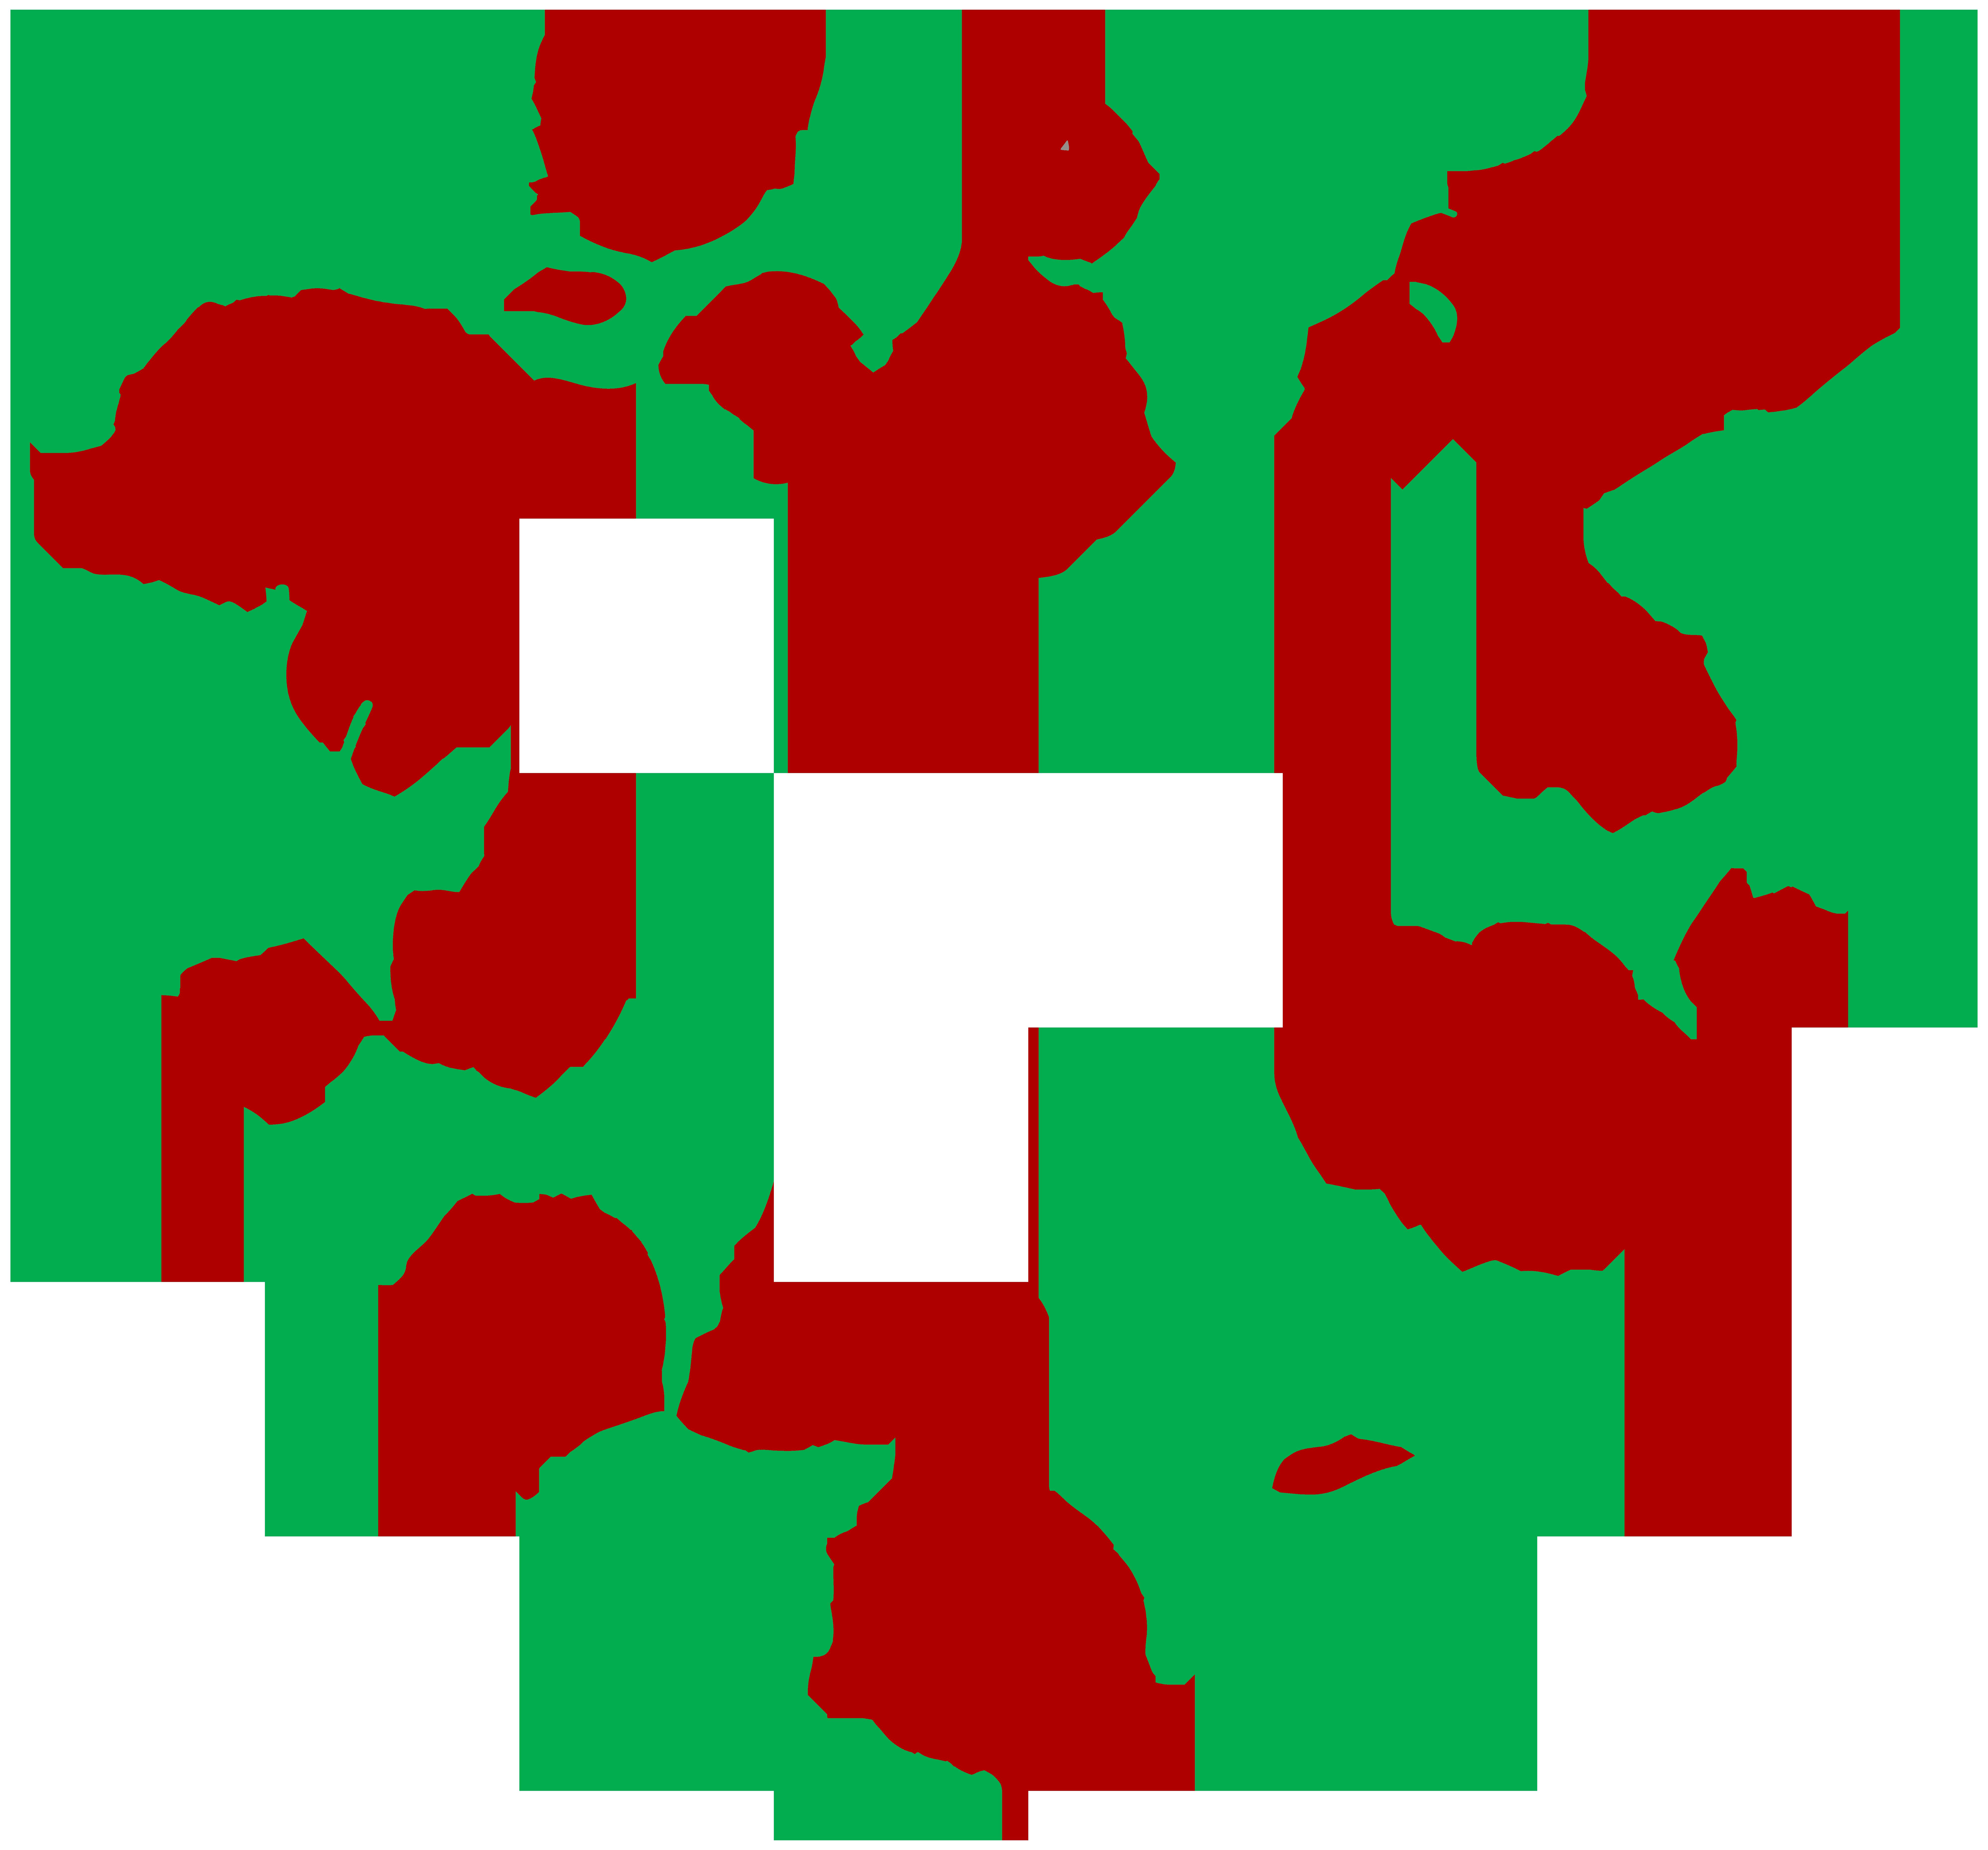 Red Rose Heart Border PNG Clip Art Image.